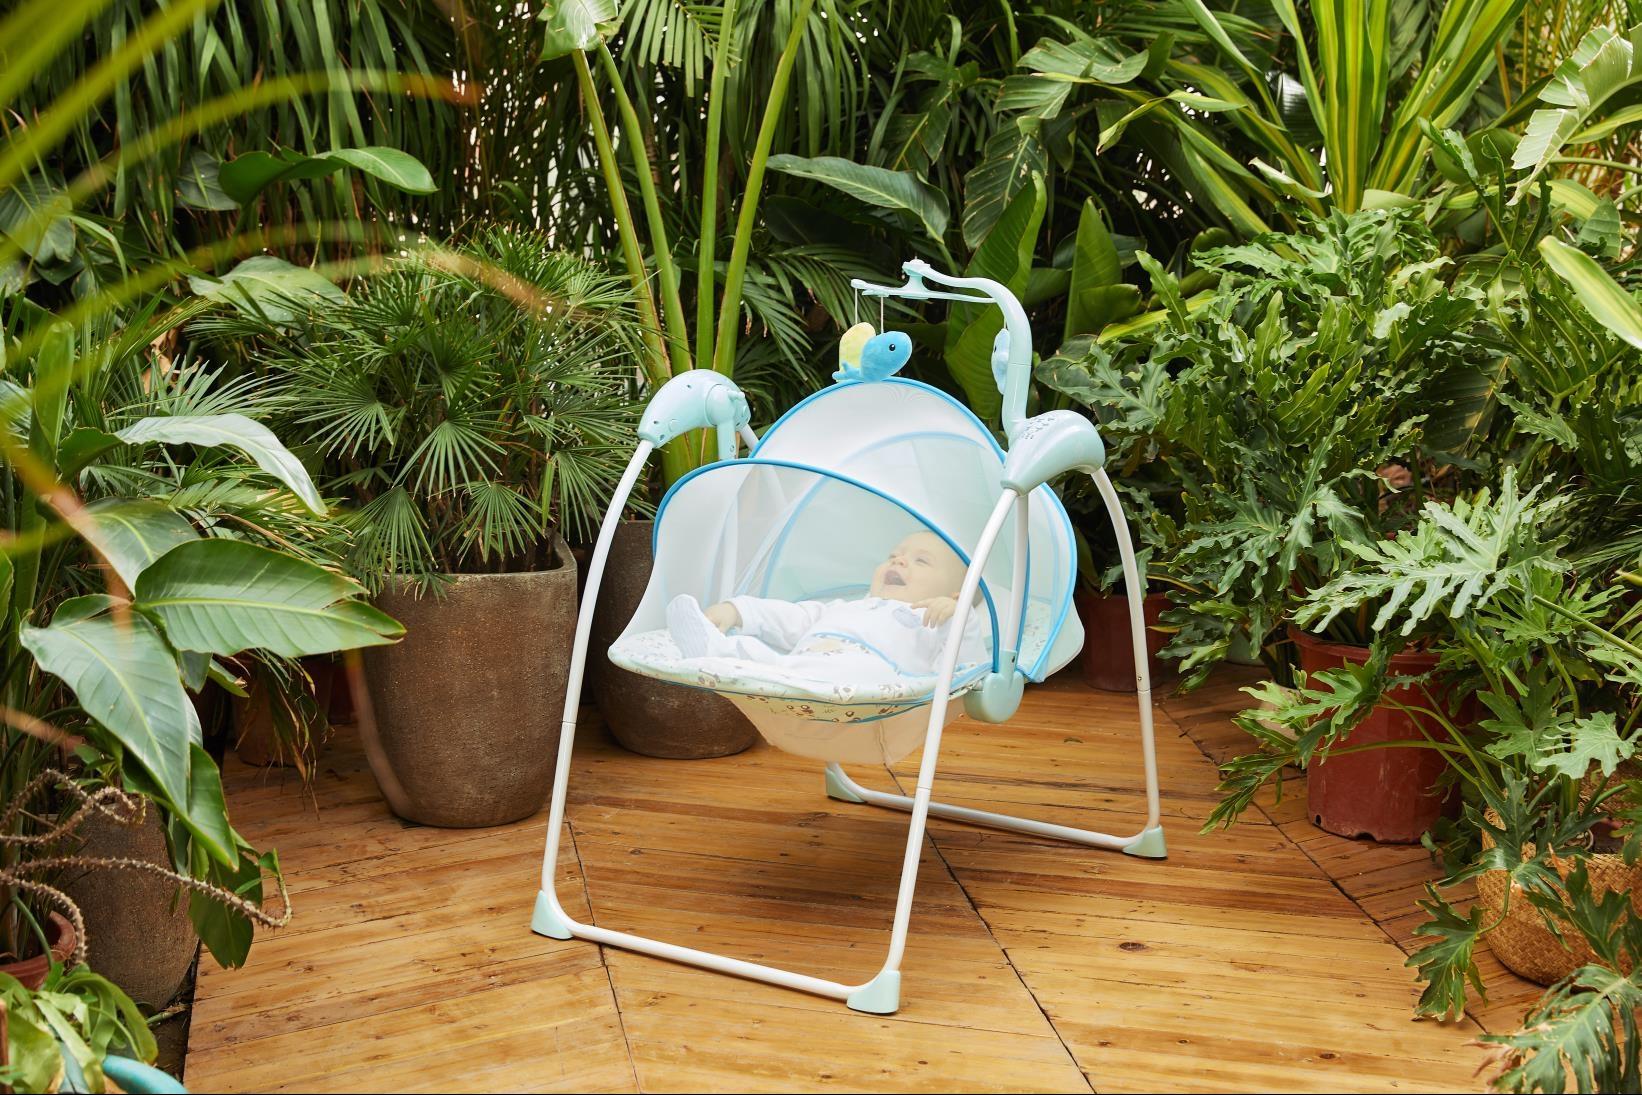 WESHIONS温纯丨婴儿童电动摇椅